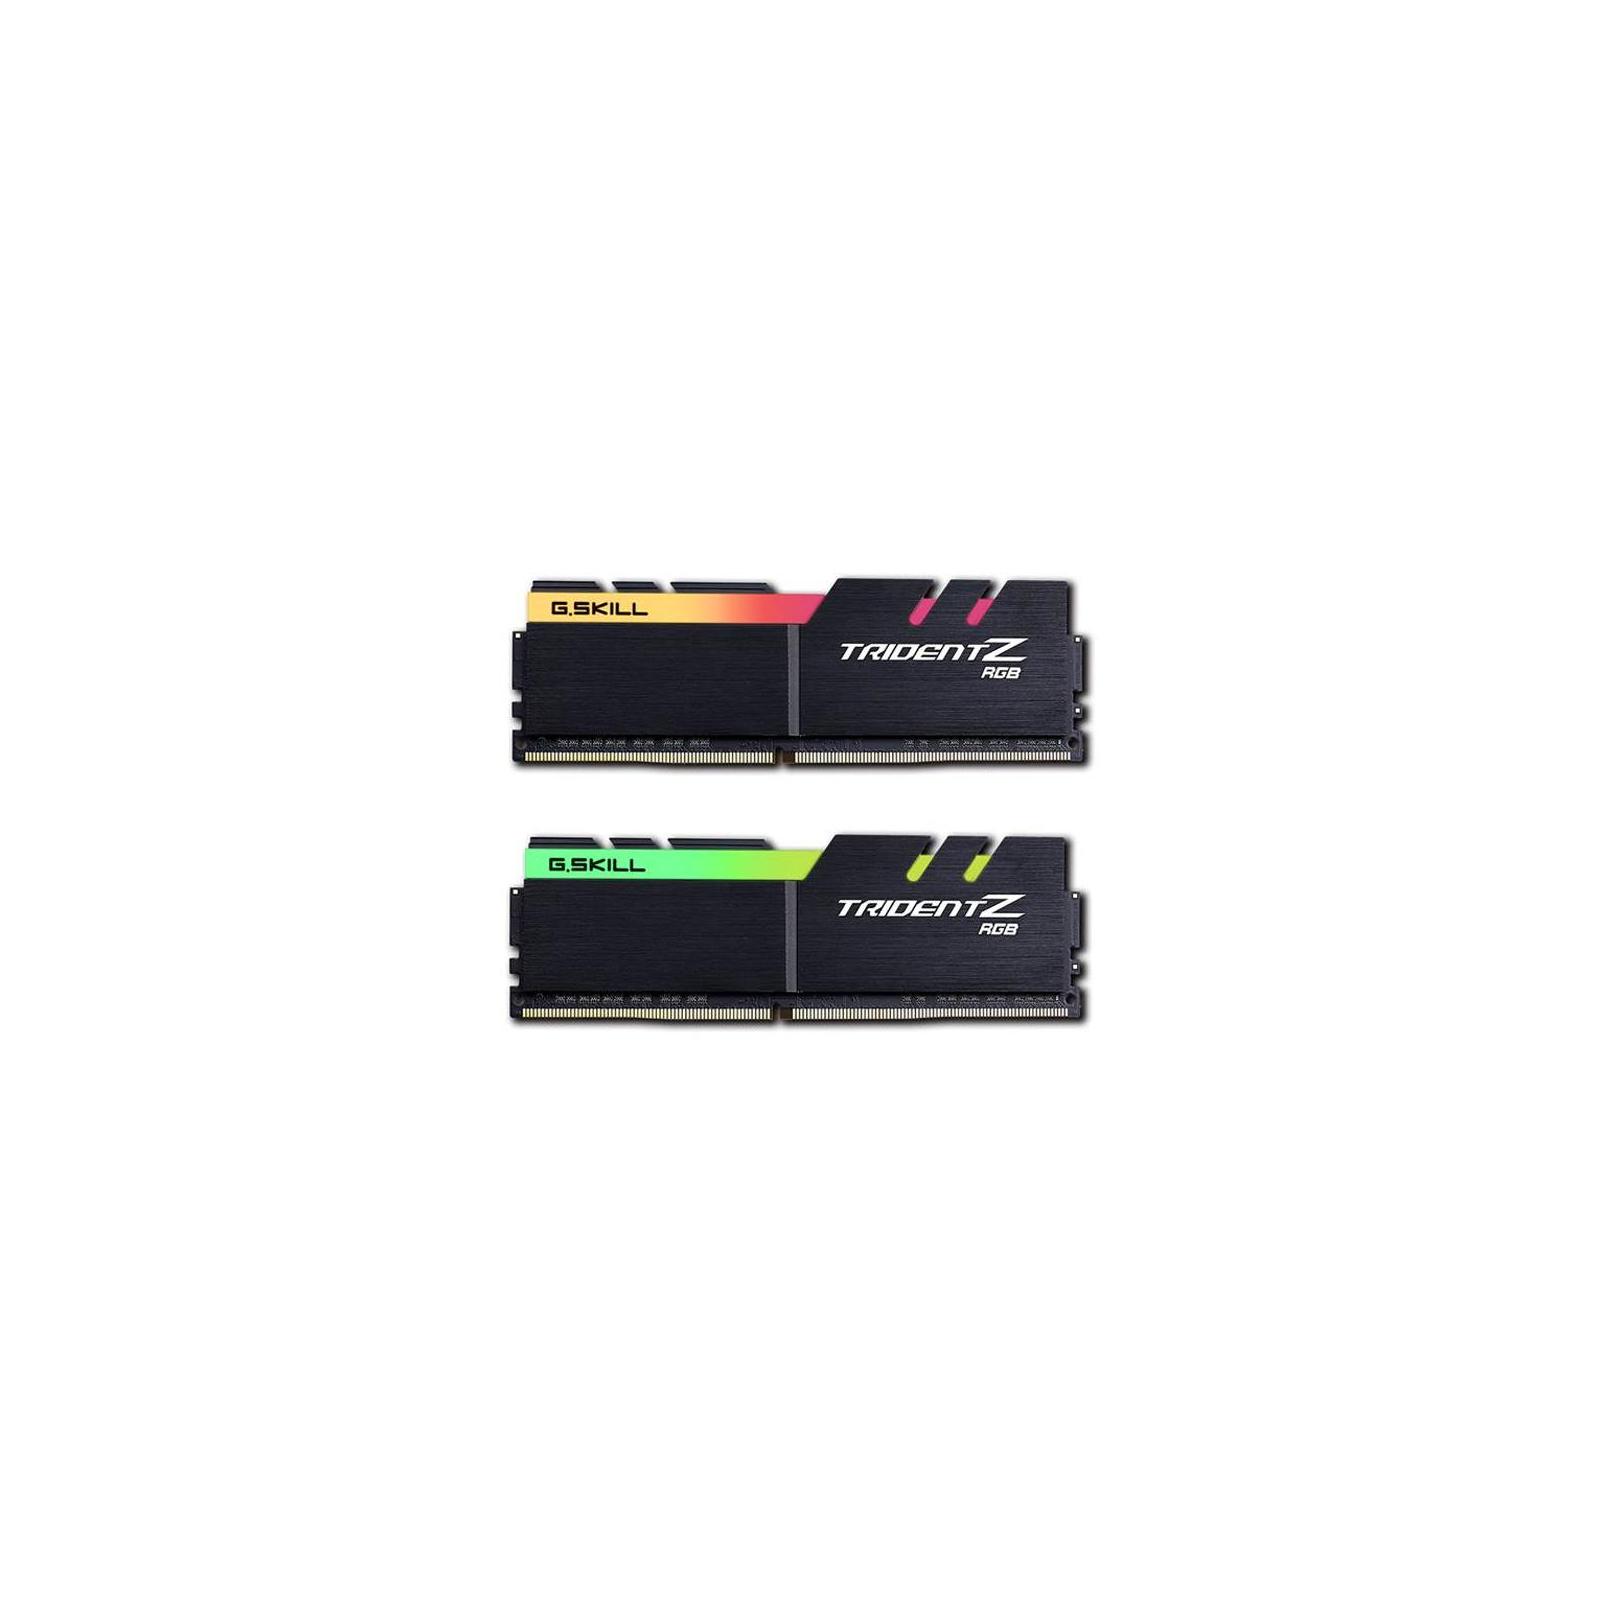 Модуль памяти для компьютера DDR4 32GB (2x16GB) 3200 MHz Trident Z RGB G.Skill (F4-3200C14D-32GTZR) изображение 3